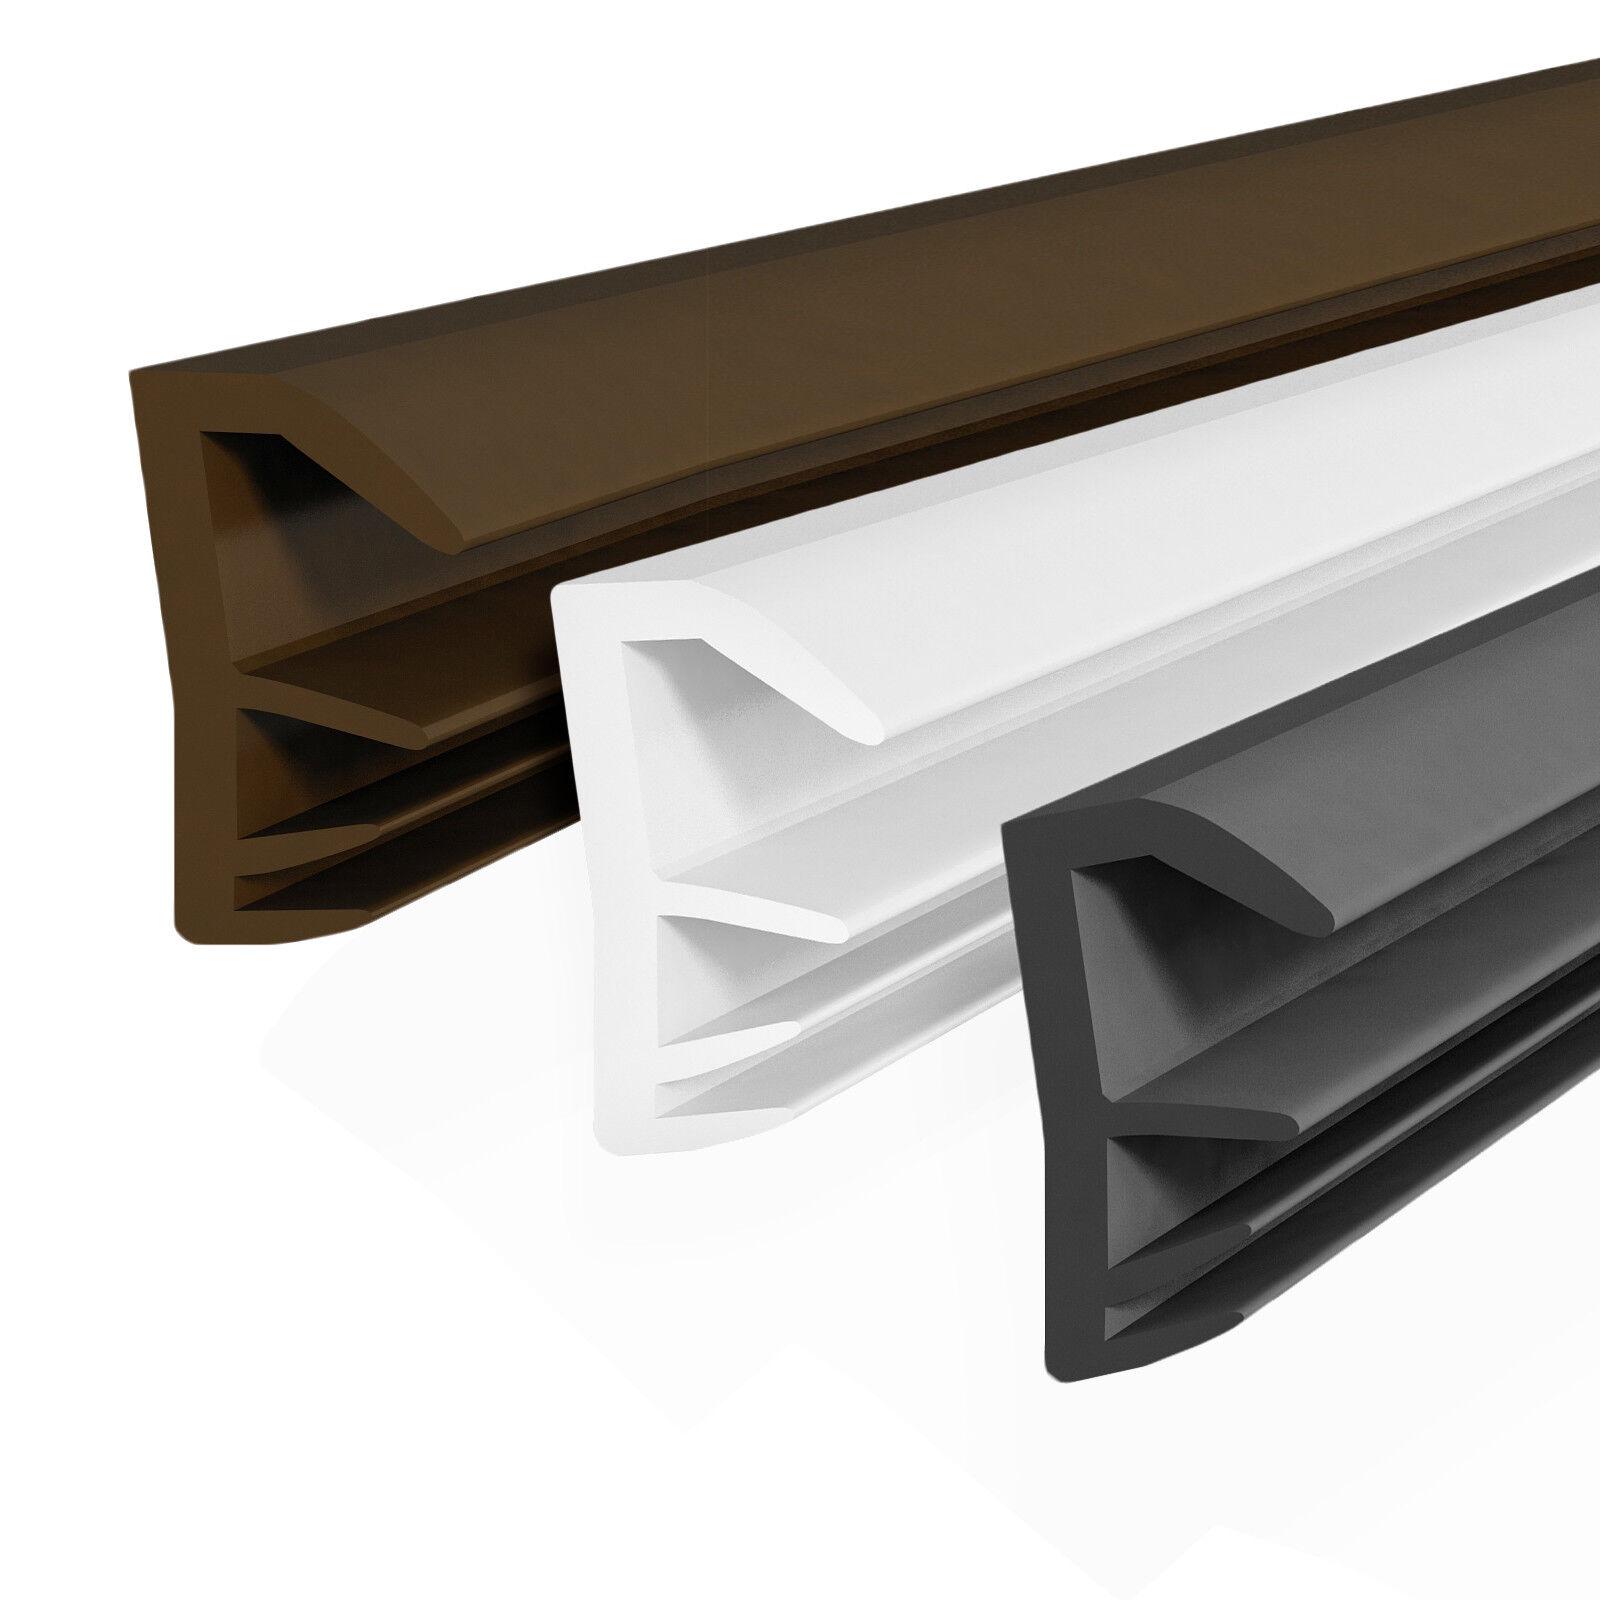 Dichtung Fenster Gummi 5 – 50 METER Abdichtung Türen recyclingfähig Flügelfalz